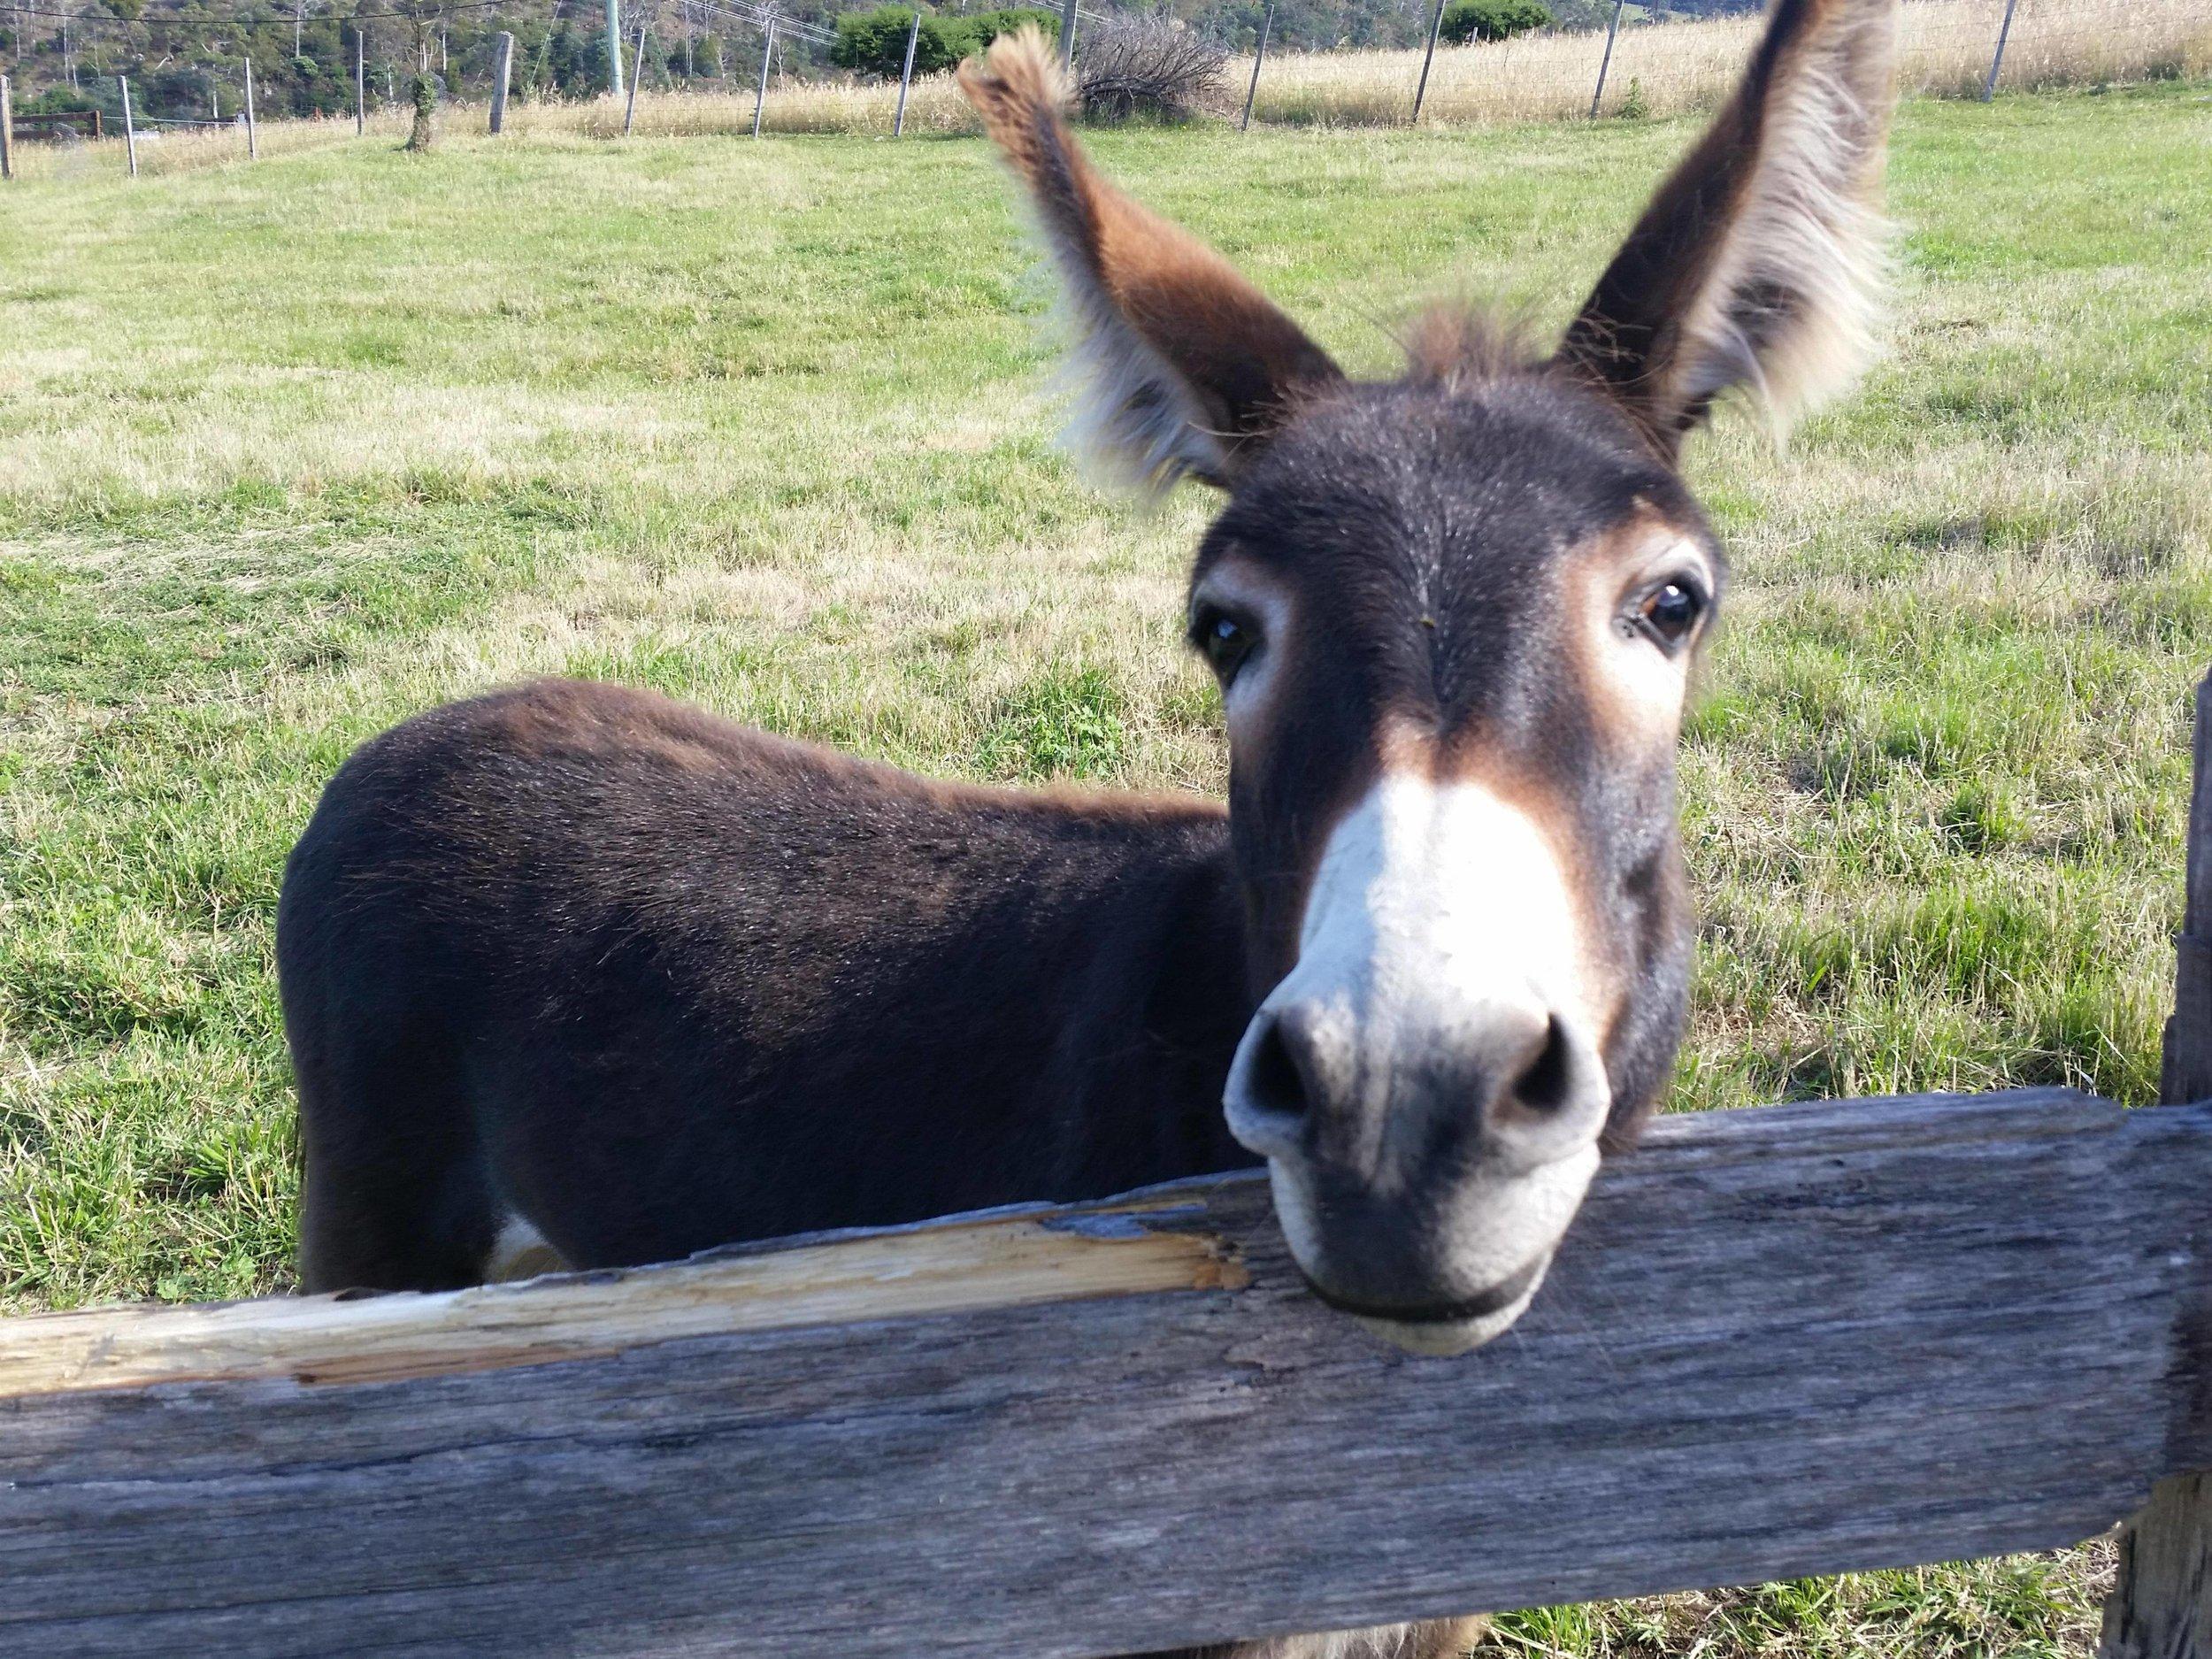 Coco the donkey